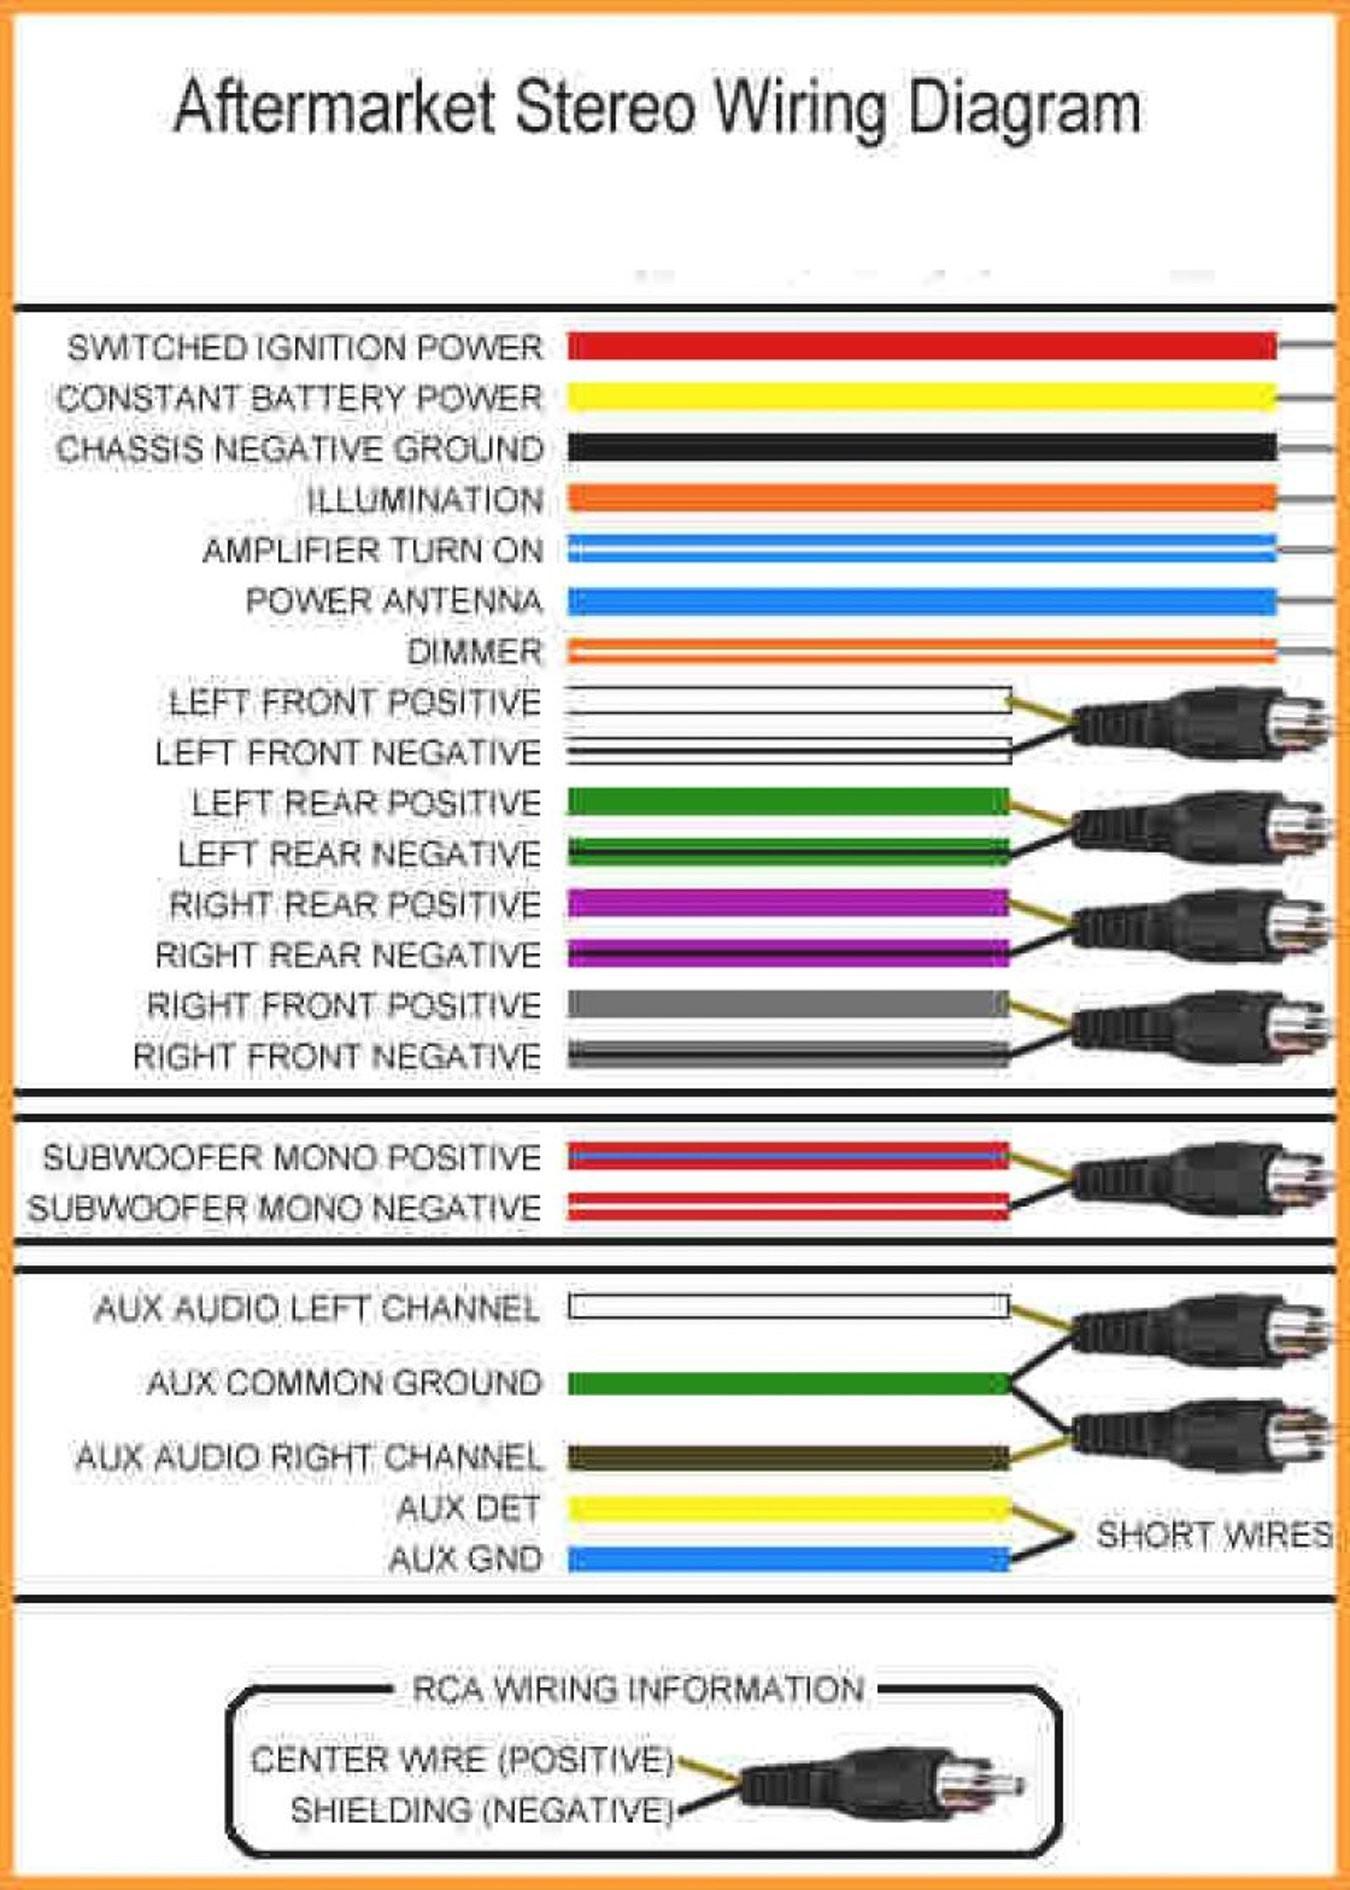 kenwood car wiring diagram maxon bmr wiring diagram ...  trusted wiring diagram scheatics